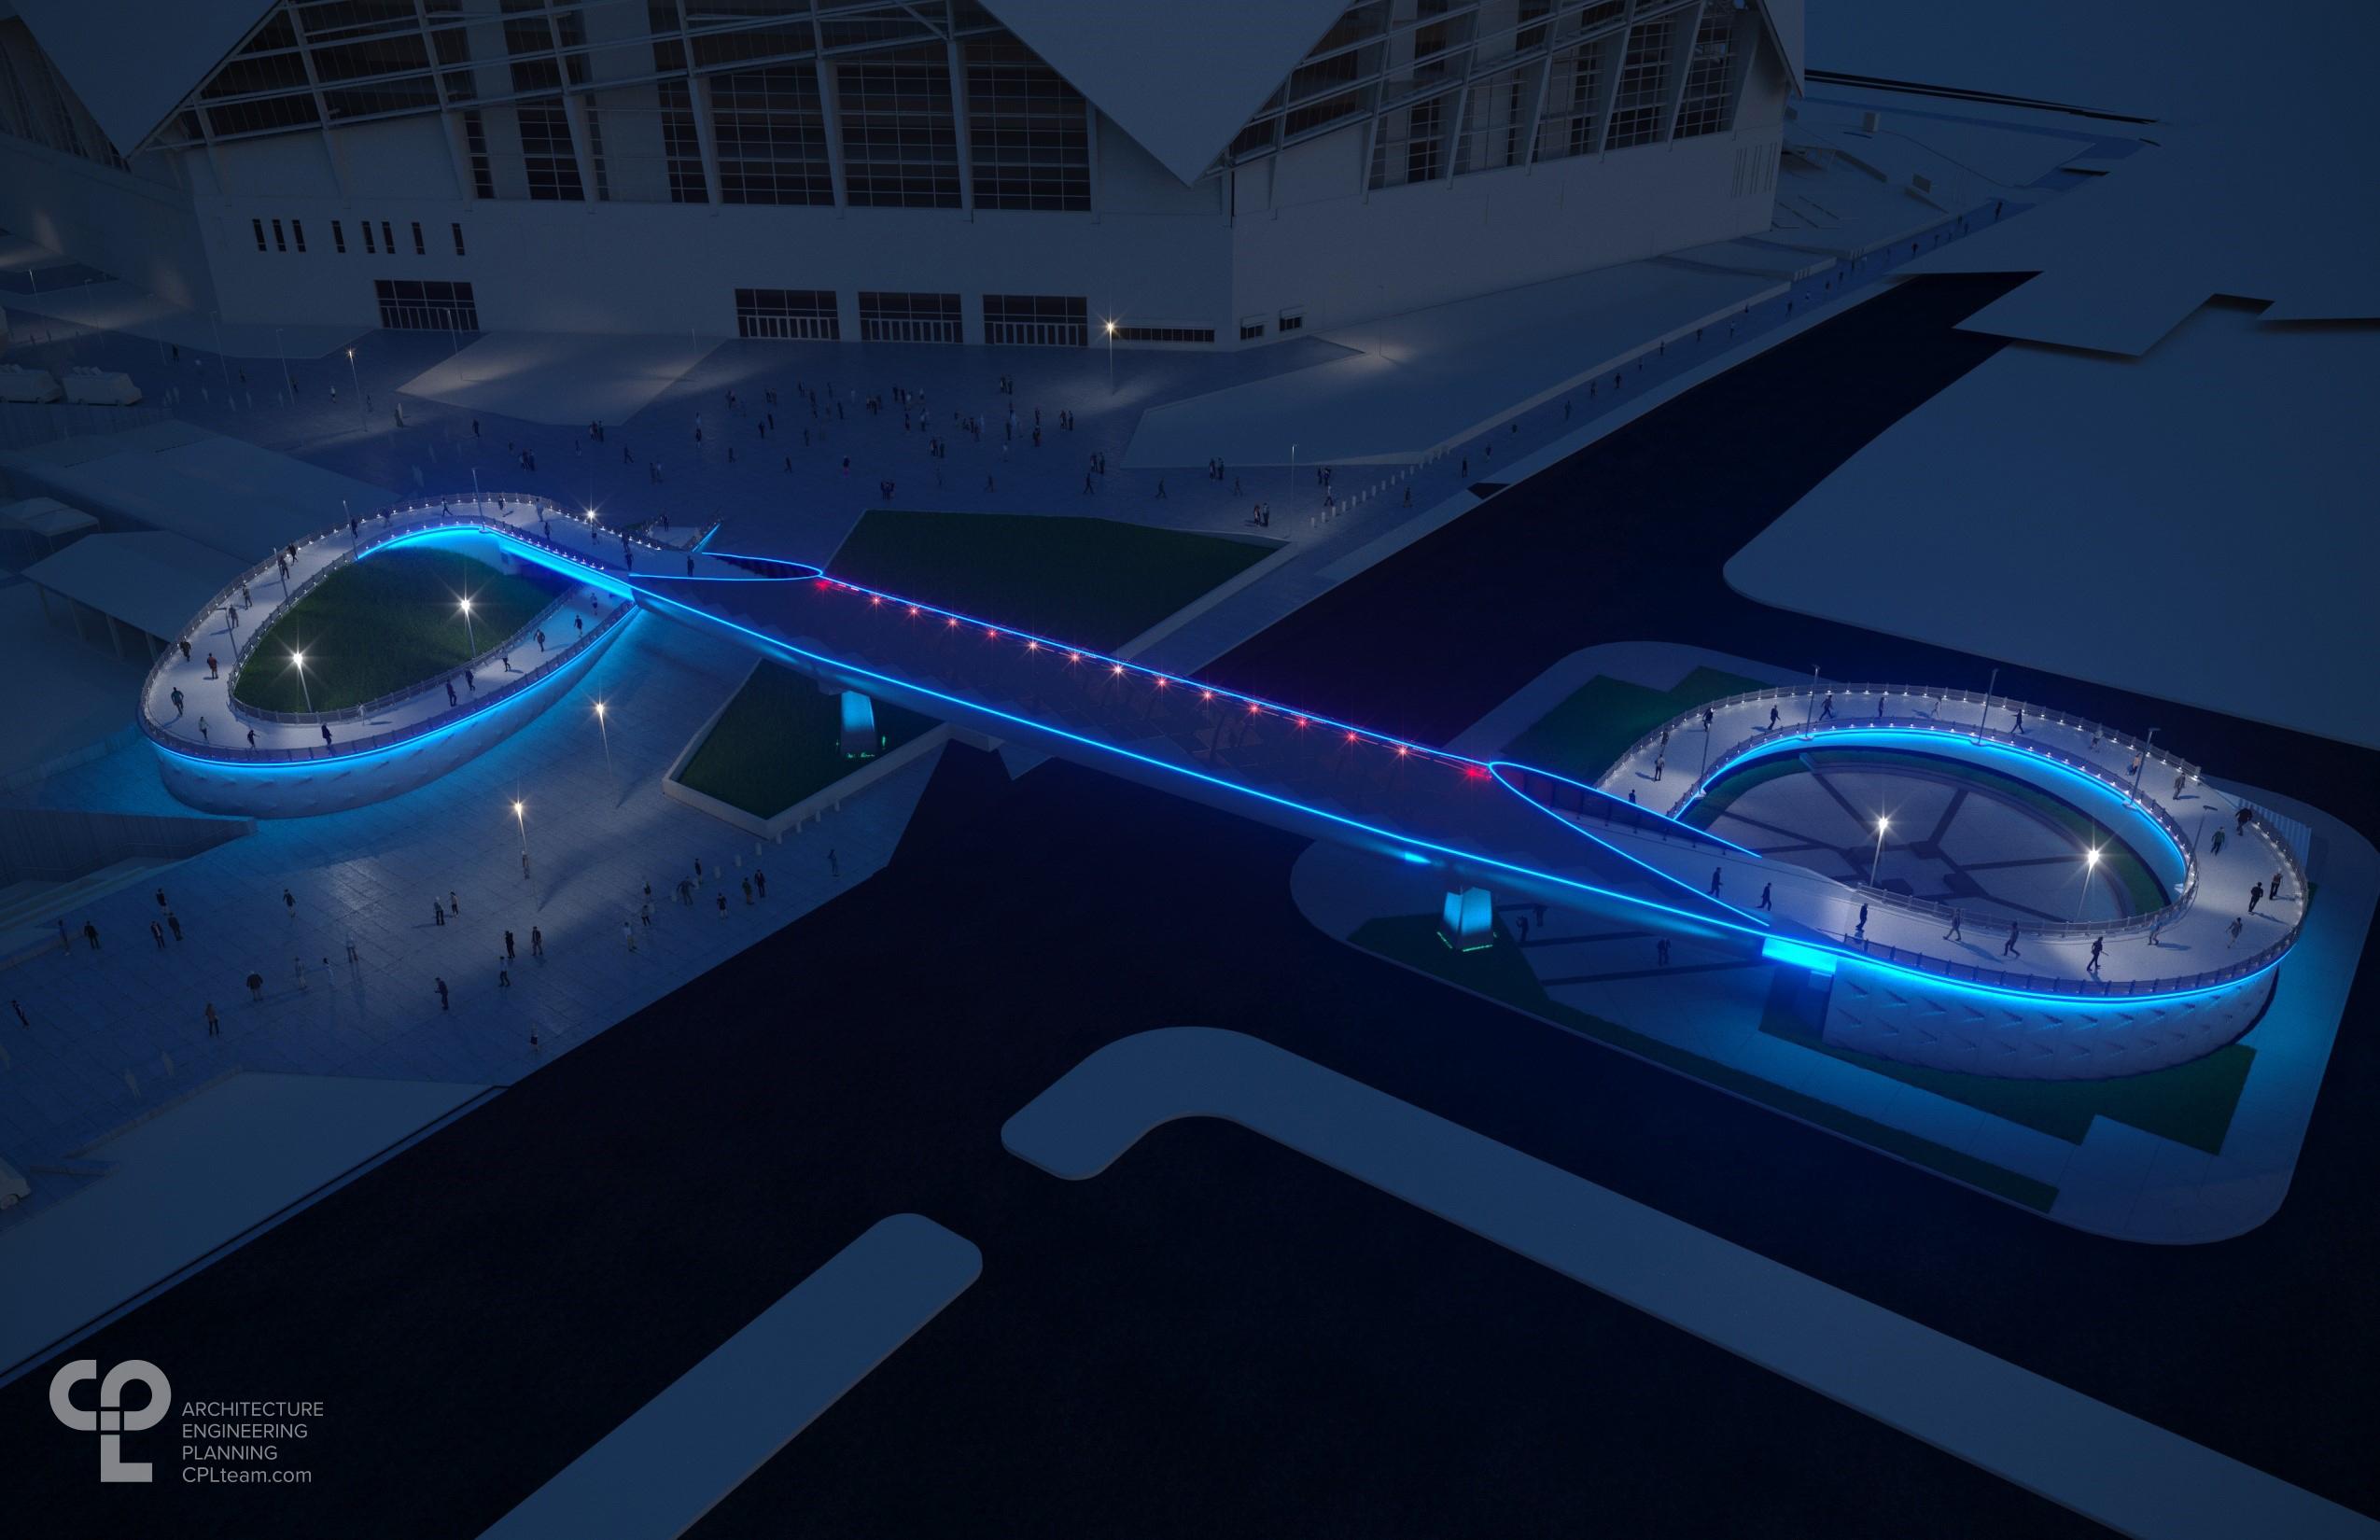 A rendering of the new Mercedes Benz Stadium bridge at night.